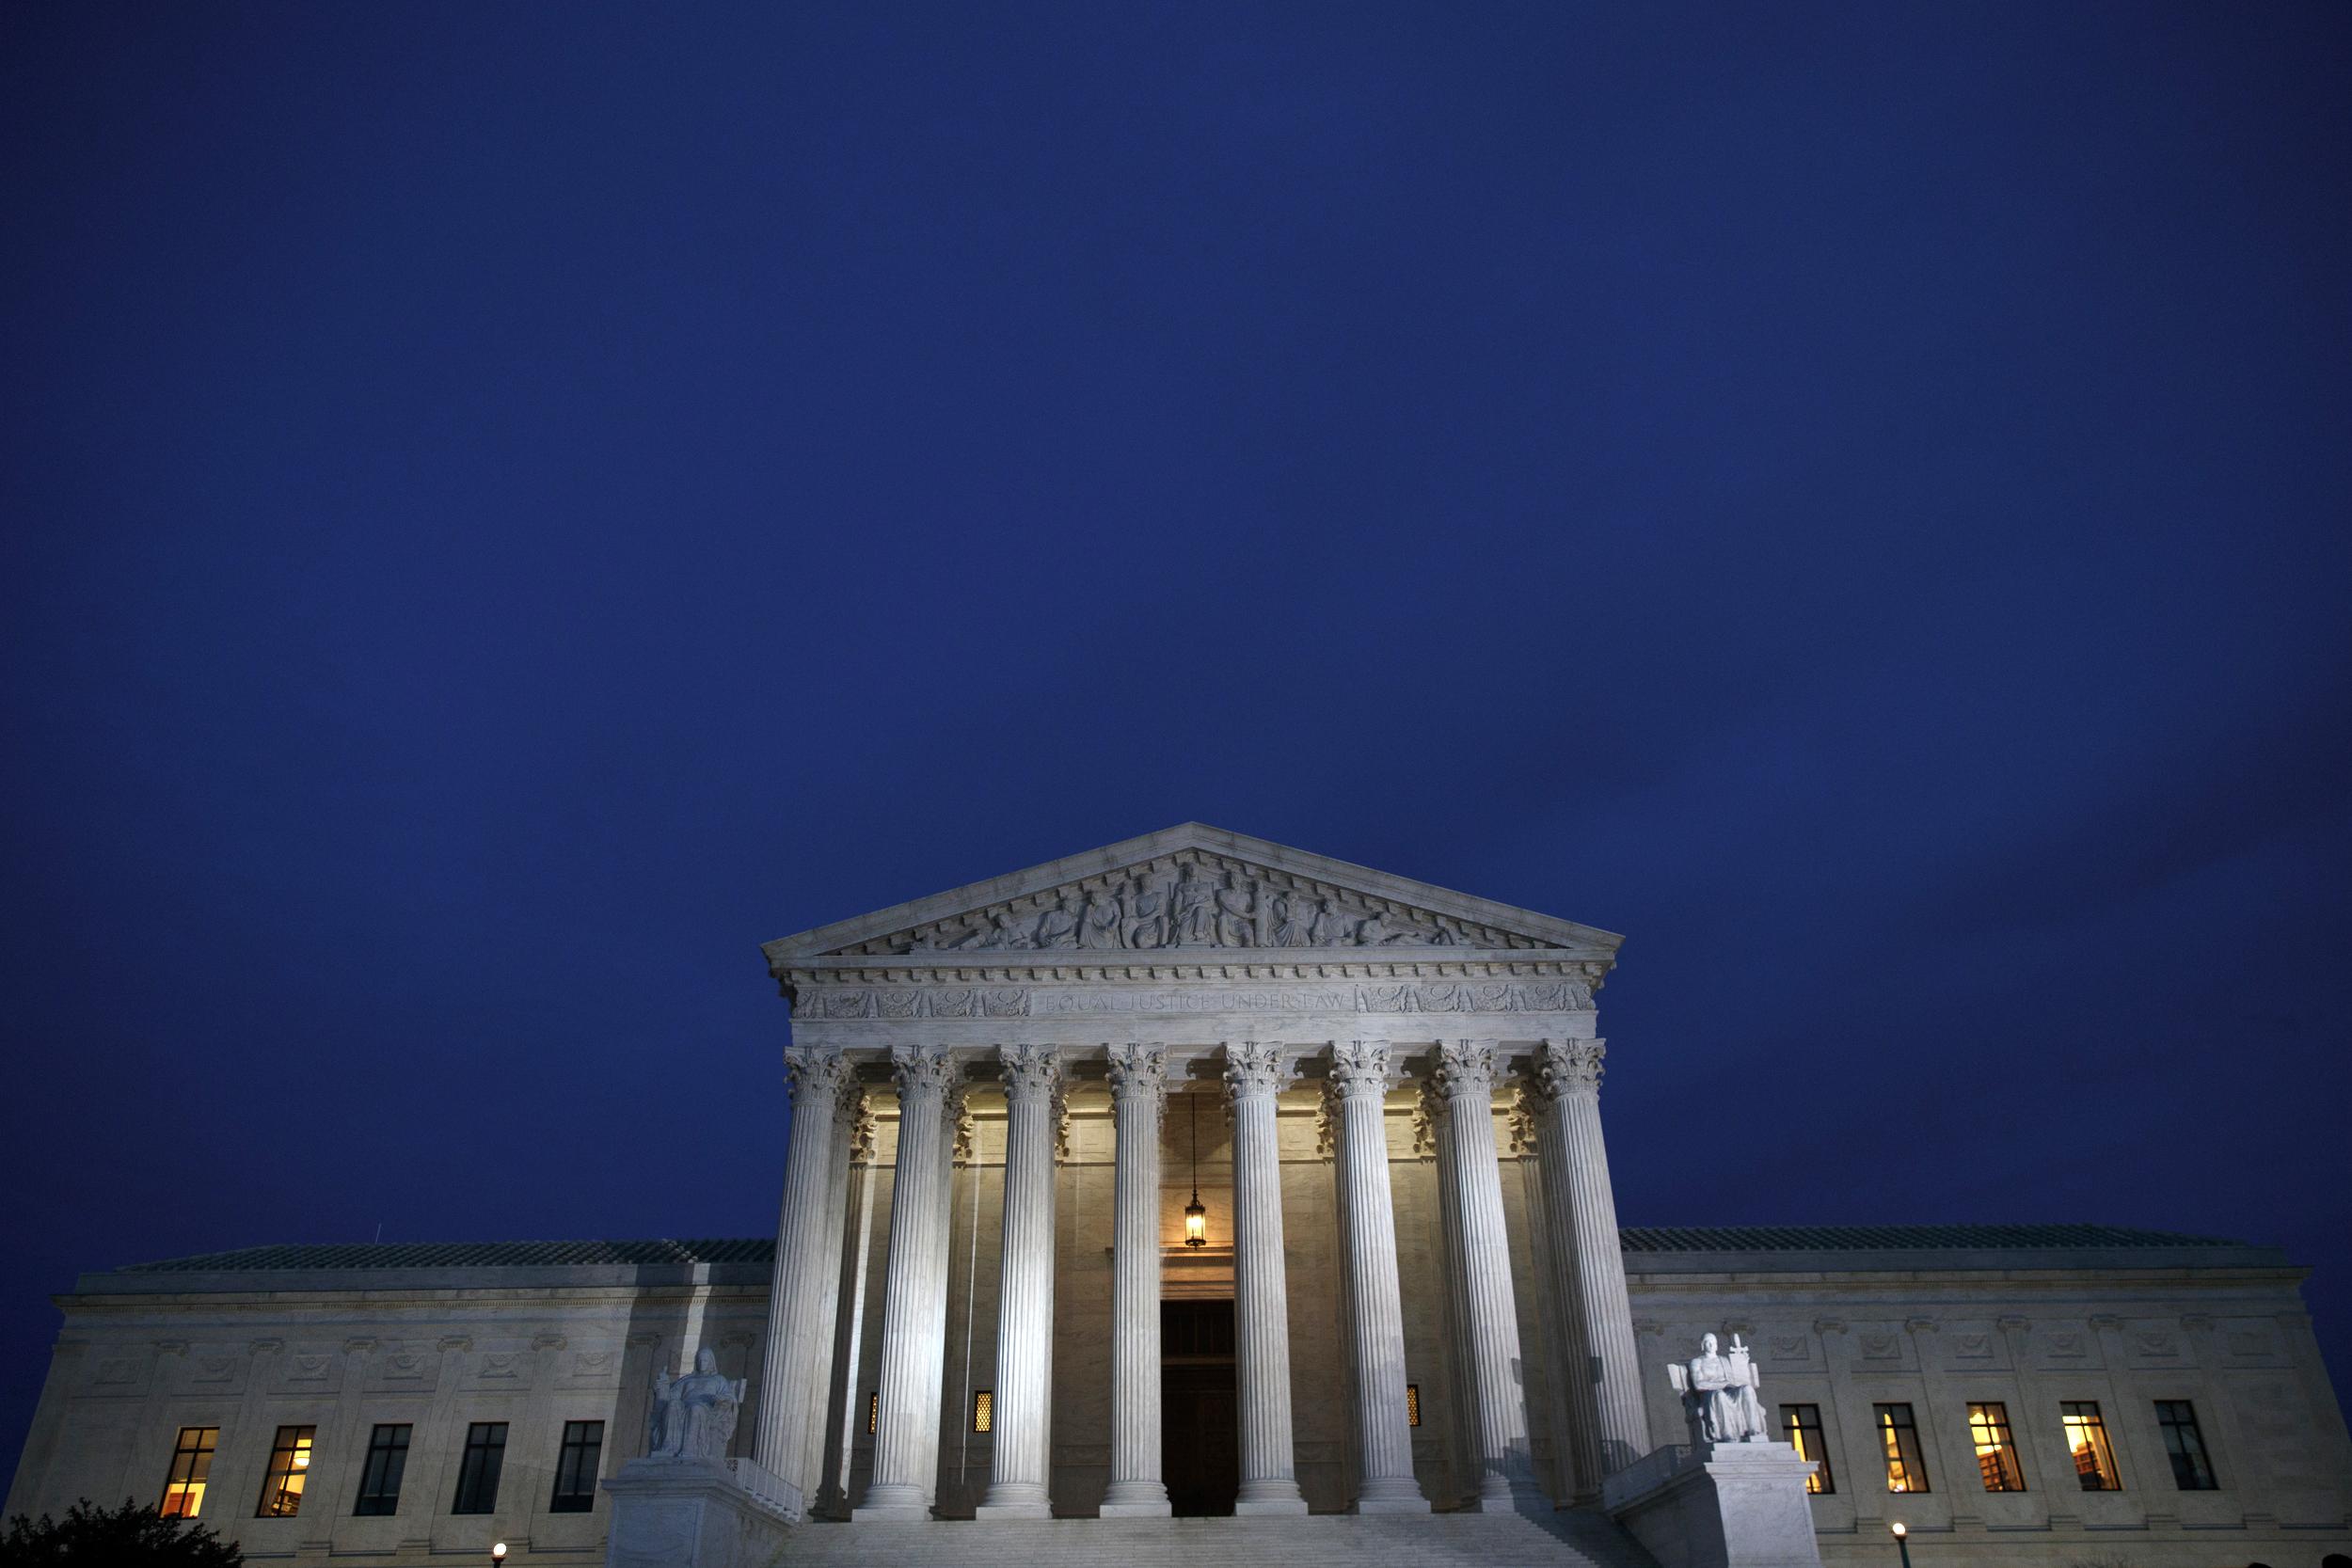 201104-supreme-court-al-0802_f4b7d7646d8